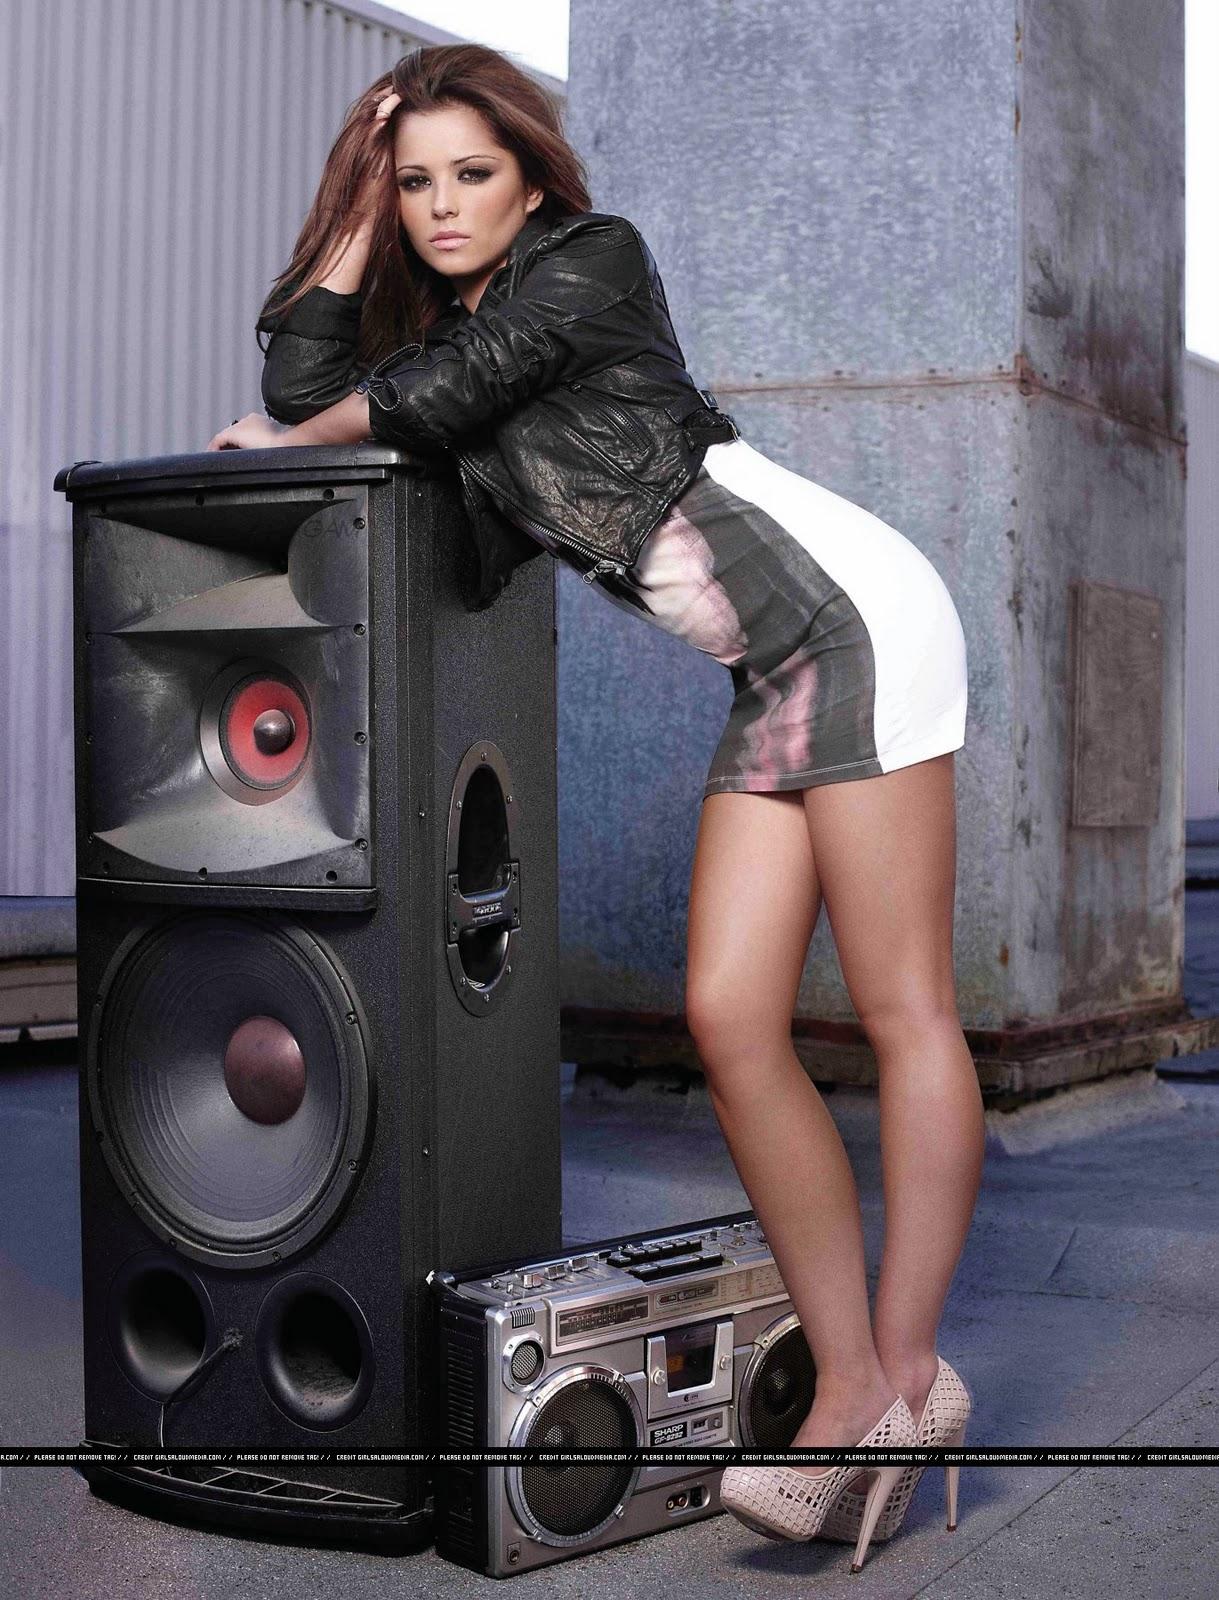 G I R L P I C T U R E S Cheryl Cole